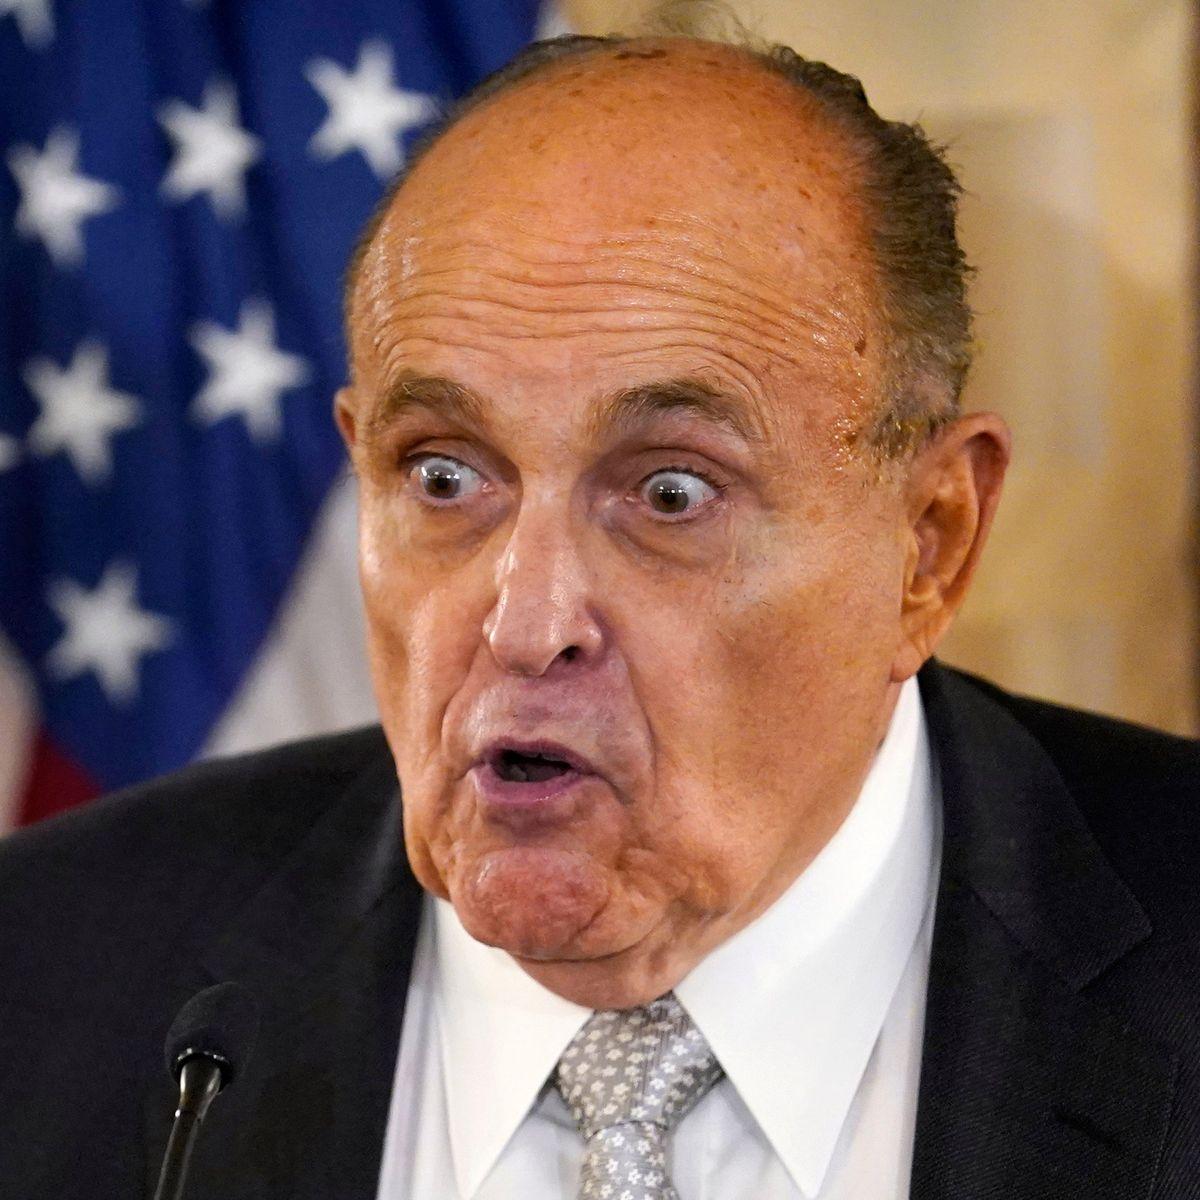 Rudy Giuliani Borat 2 Scene: Everything We Know